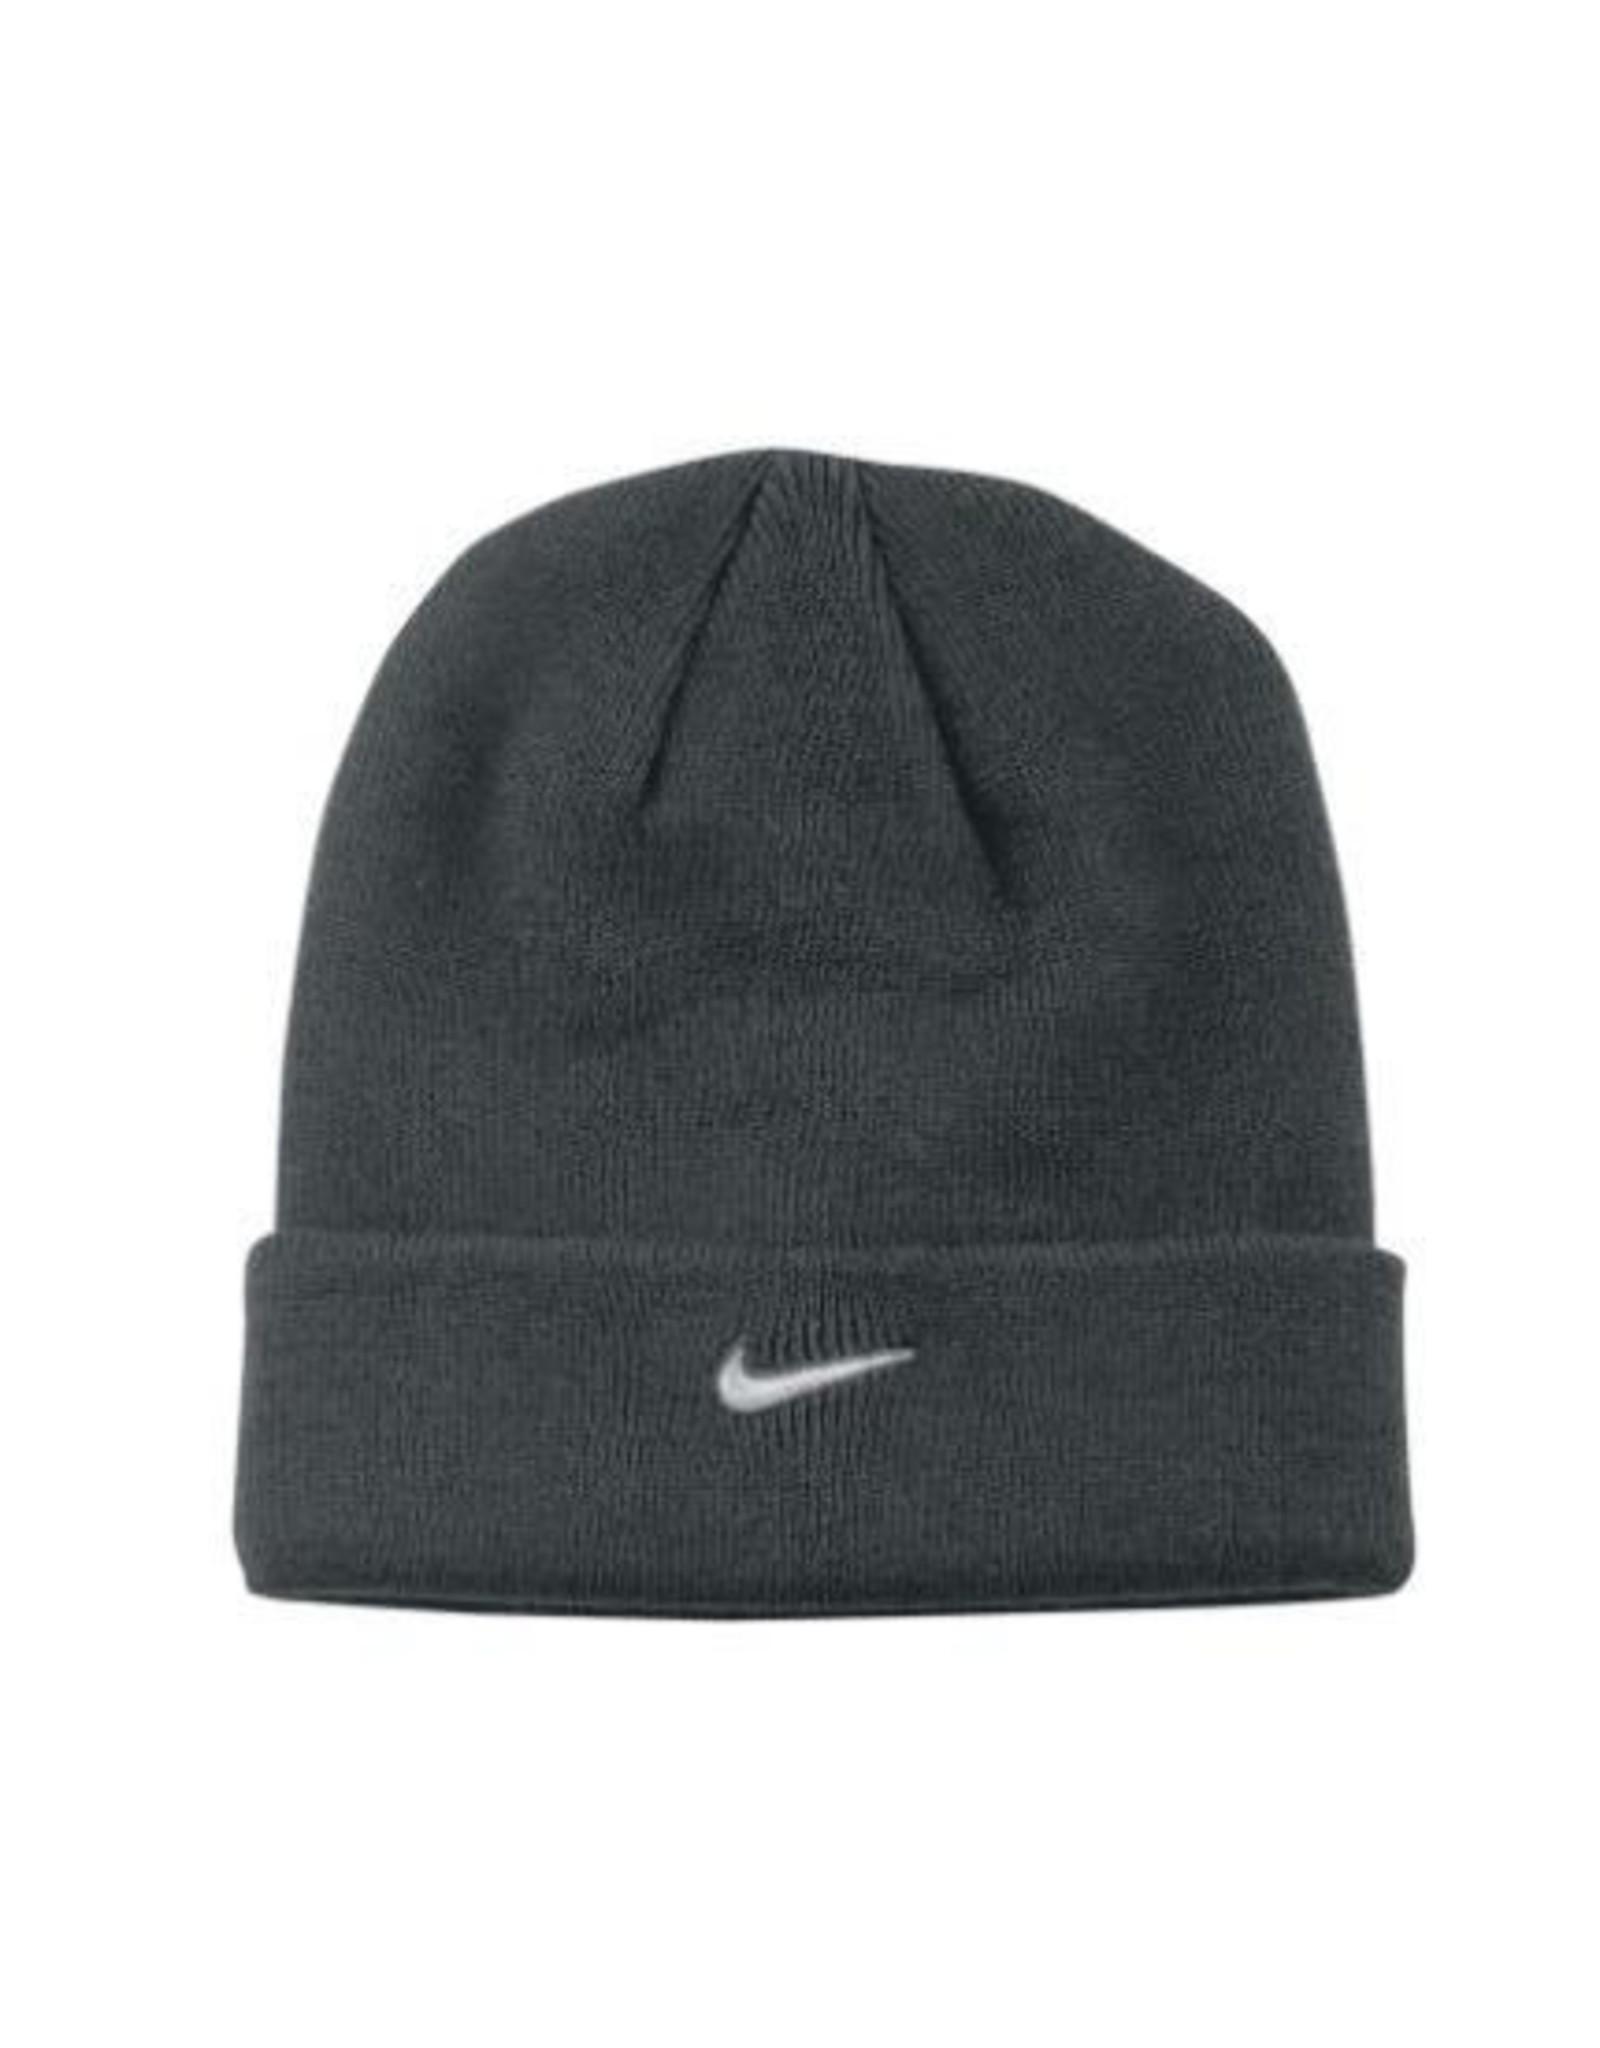 NON-UNIFORM Nike Team Sideline Beanie, custom hat